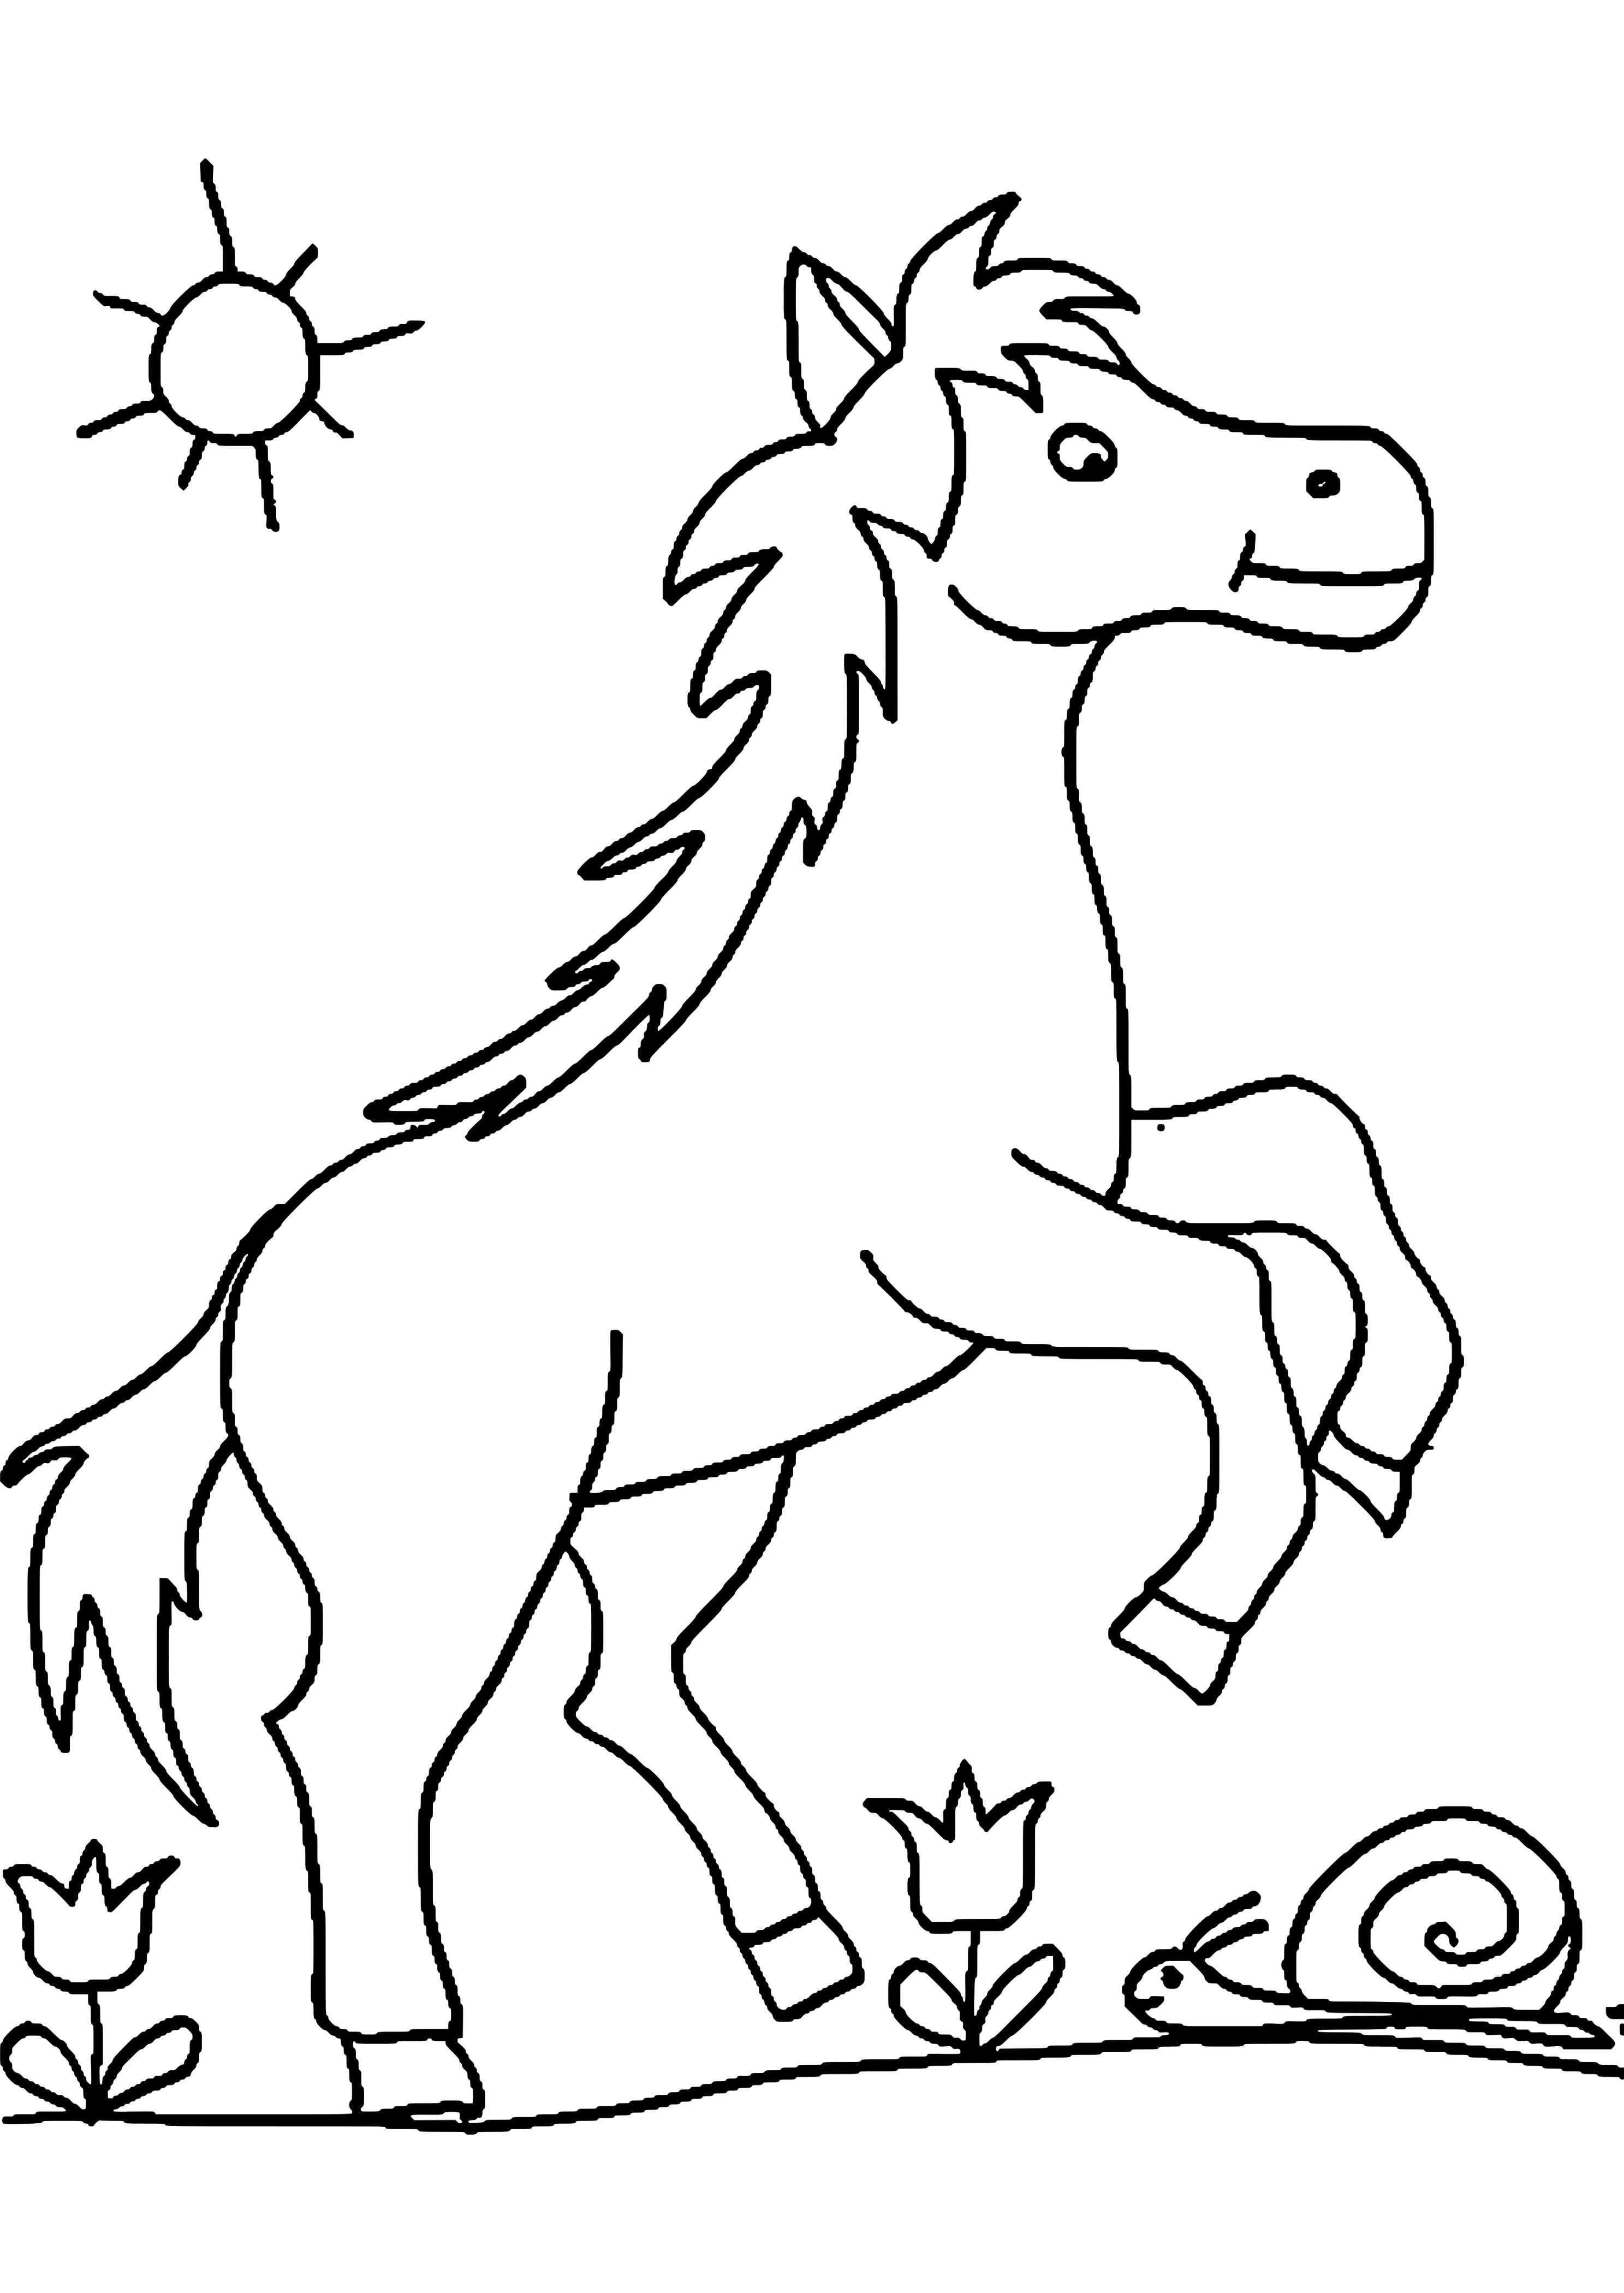 Ausmalbilder Pferde im Schnee | Basteln | Pinterest | Mandala and ...